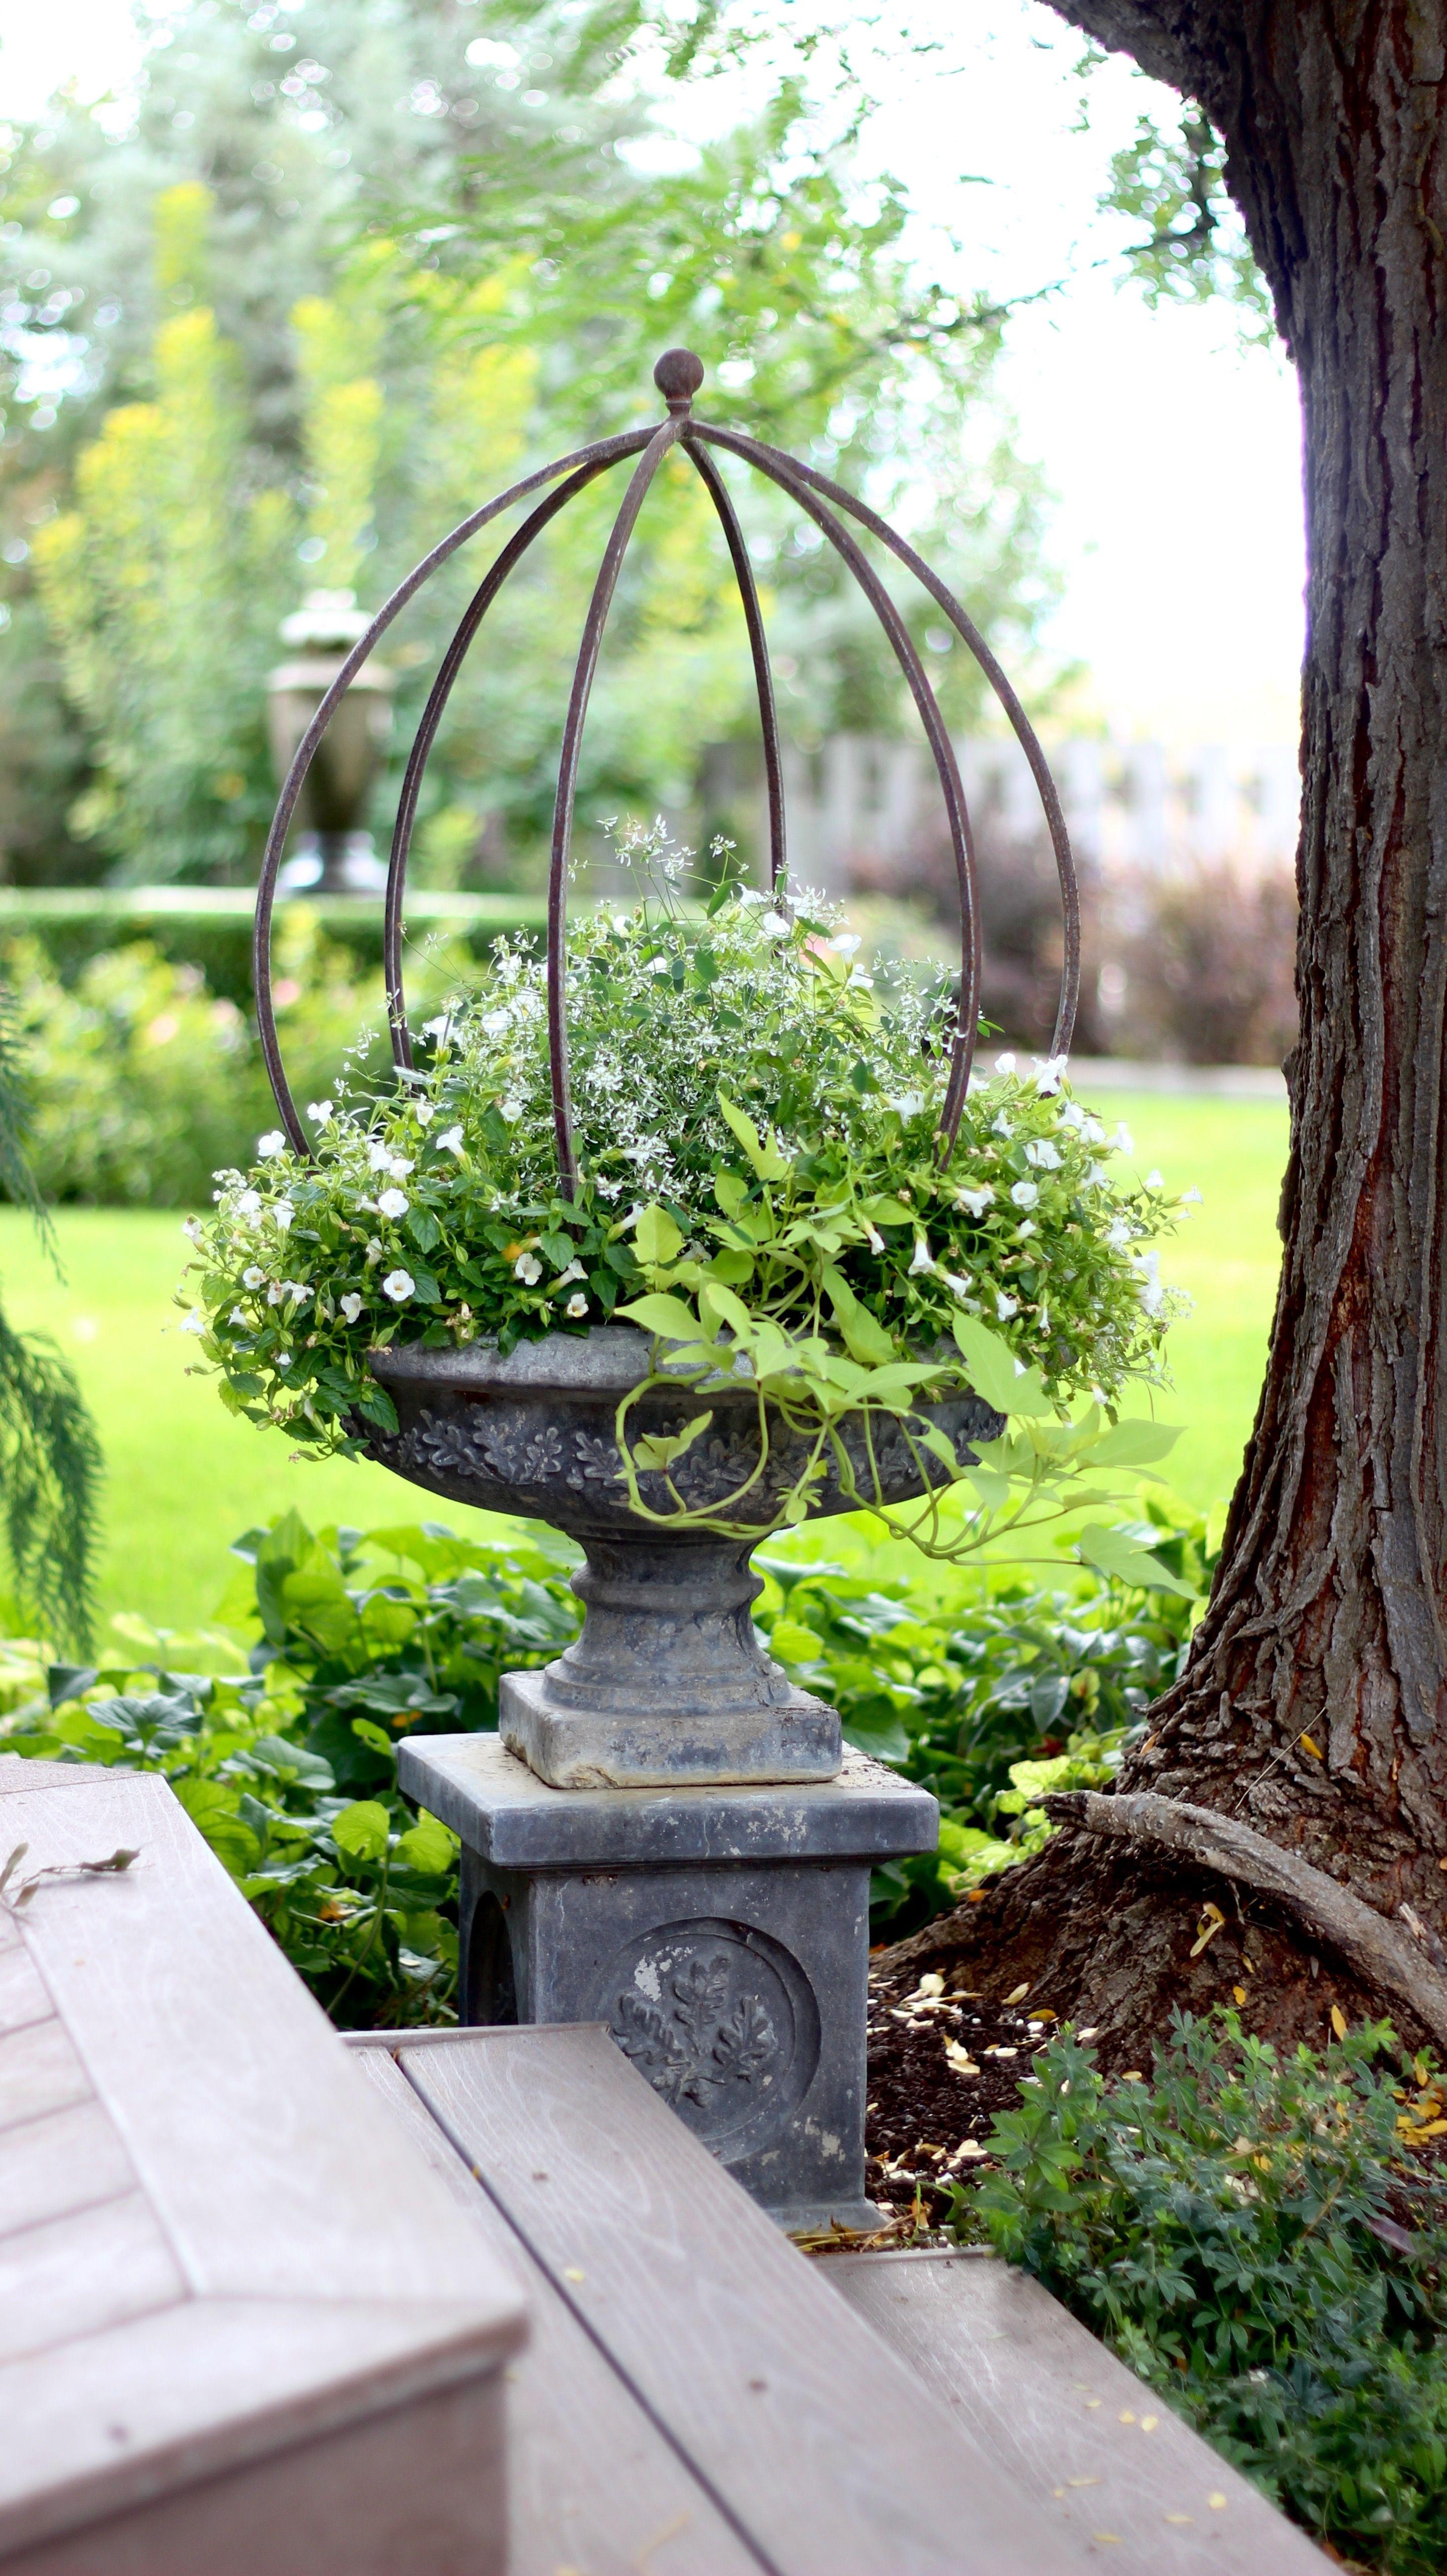 Garden Ornaments to Decorate Your Garden | Garden projects, Gardens ...